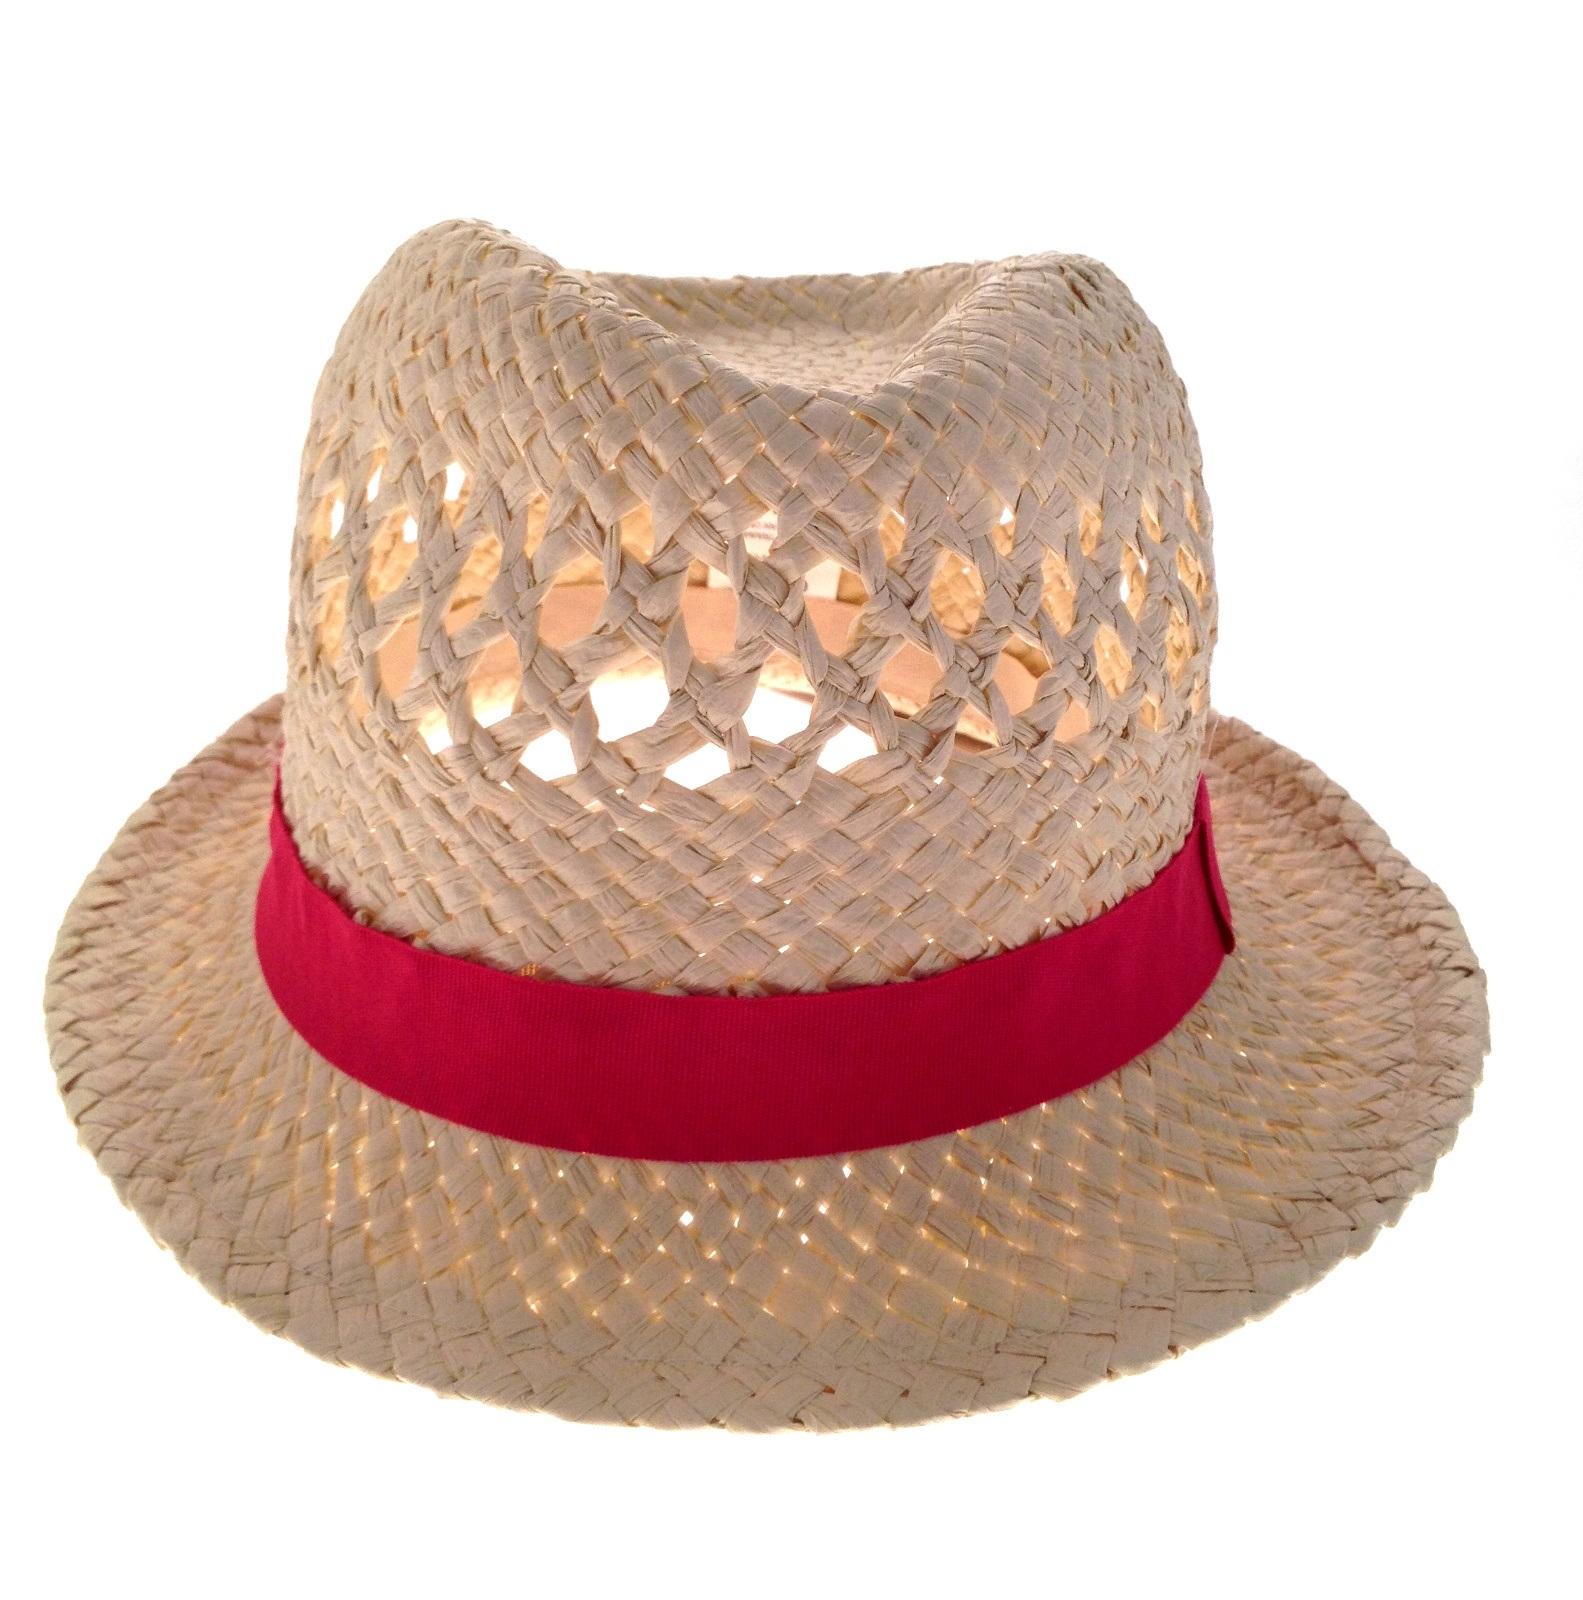 Para-Mujer-De-Paja-Verano-Sombrero-Semi-ala-Unisex-Sol-Panama-Fedora-Para-Hombre-Trilby-Sombrero miniatura 13